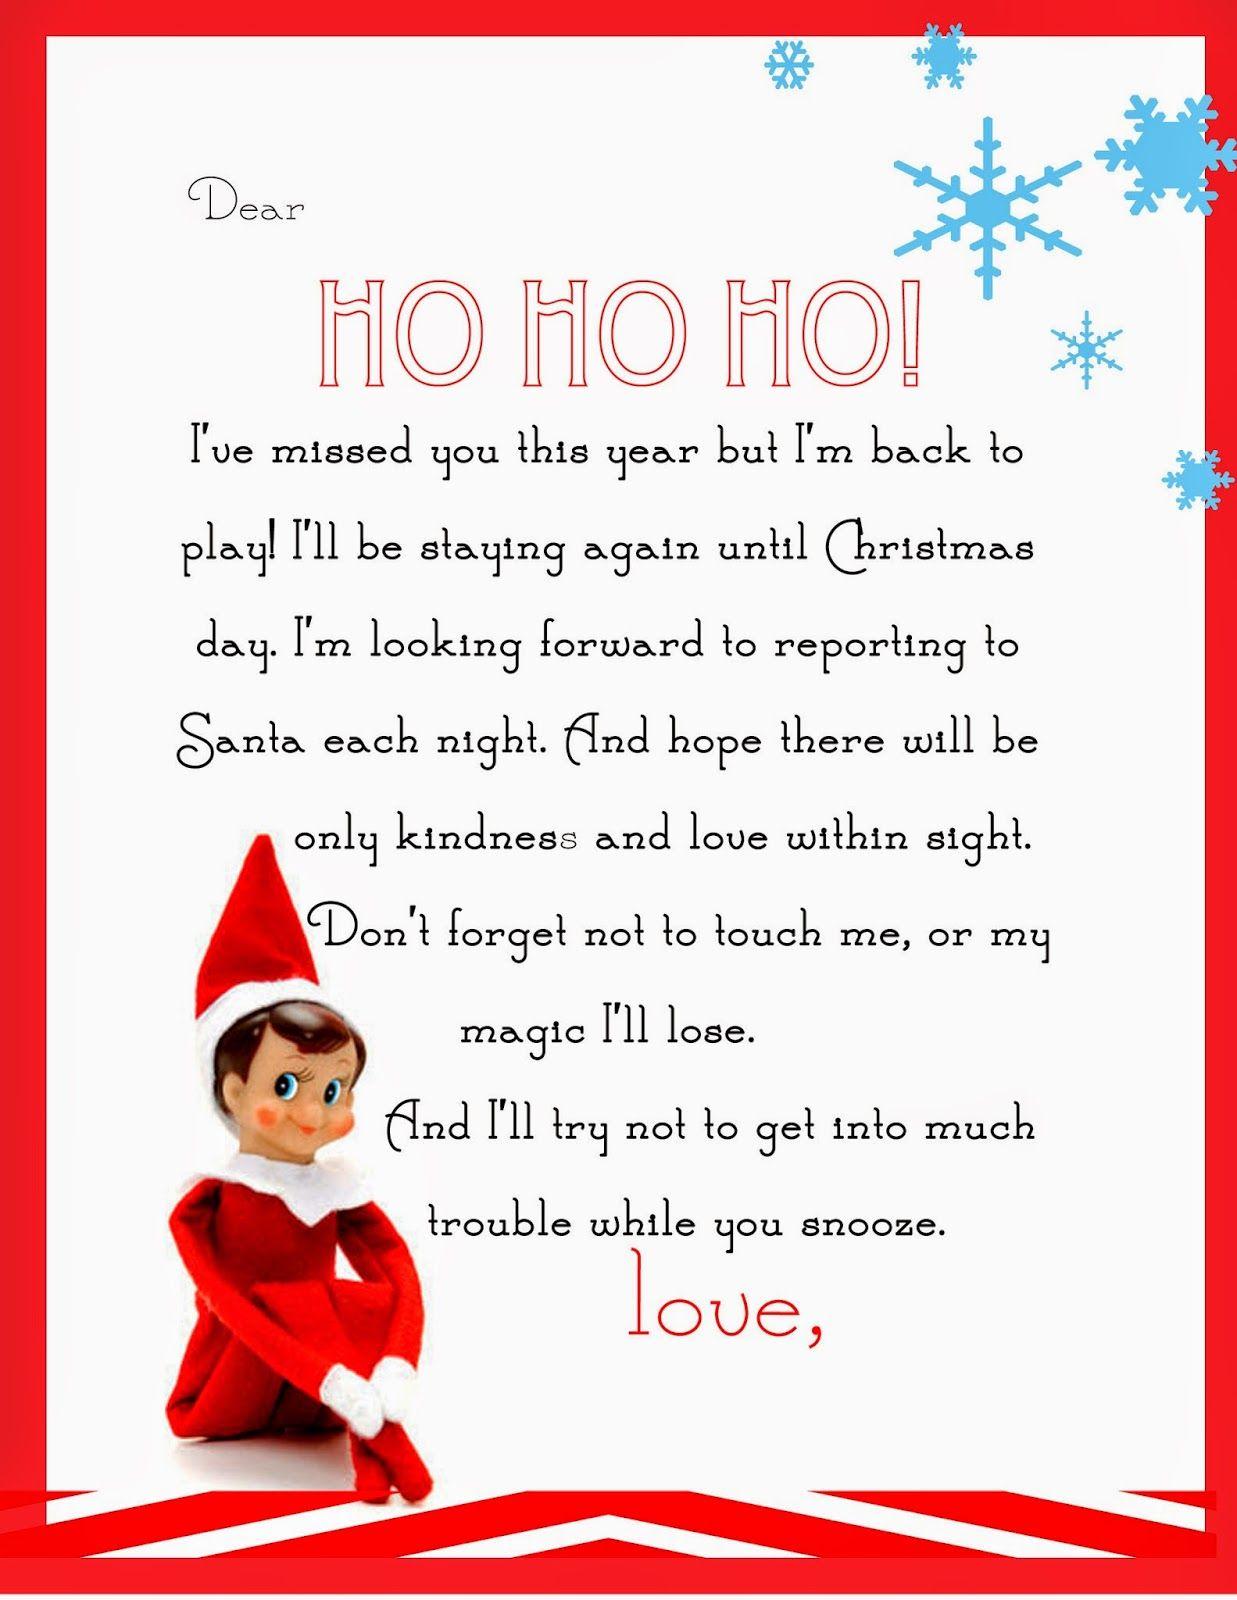 Elf On The Shelf Letter {Free Printable} | Para Las Muñecas - Elf On The Shelf Goodbye Letter Free Printable